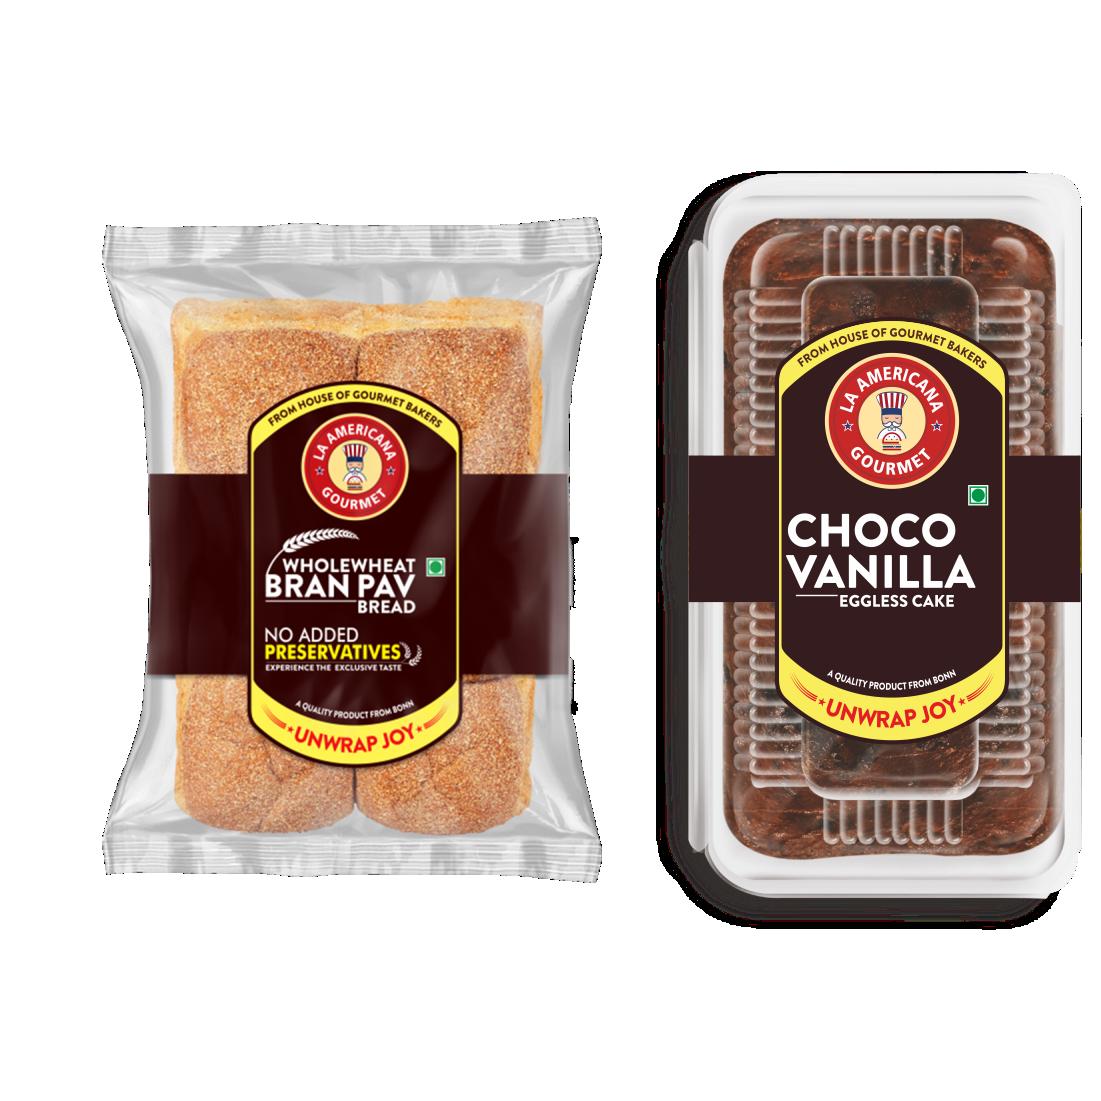 LA Americana Wholewheat Bran Pav Bread 250g (2 Packs) and Eggless Choco Vanilla Cake 200g (1 Pack)